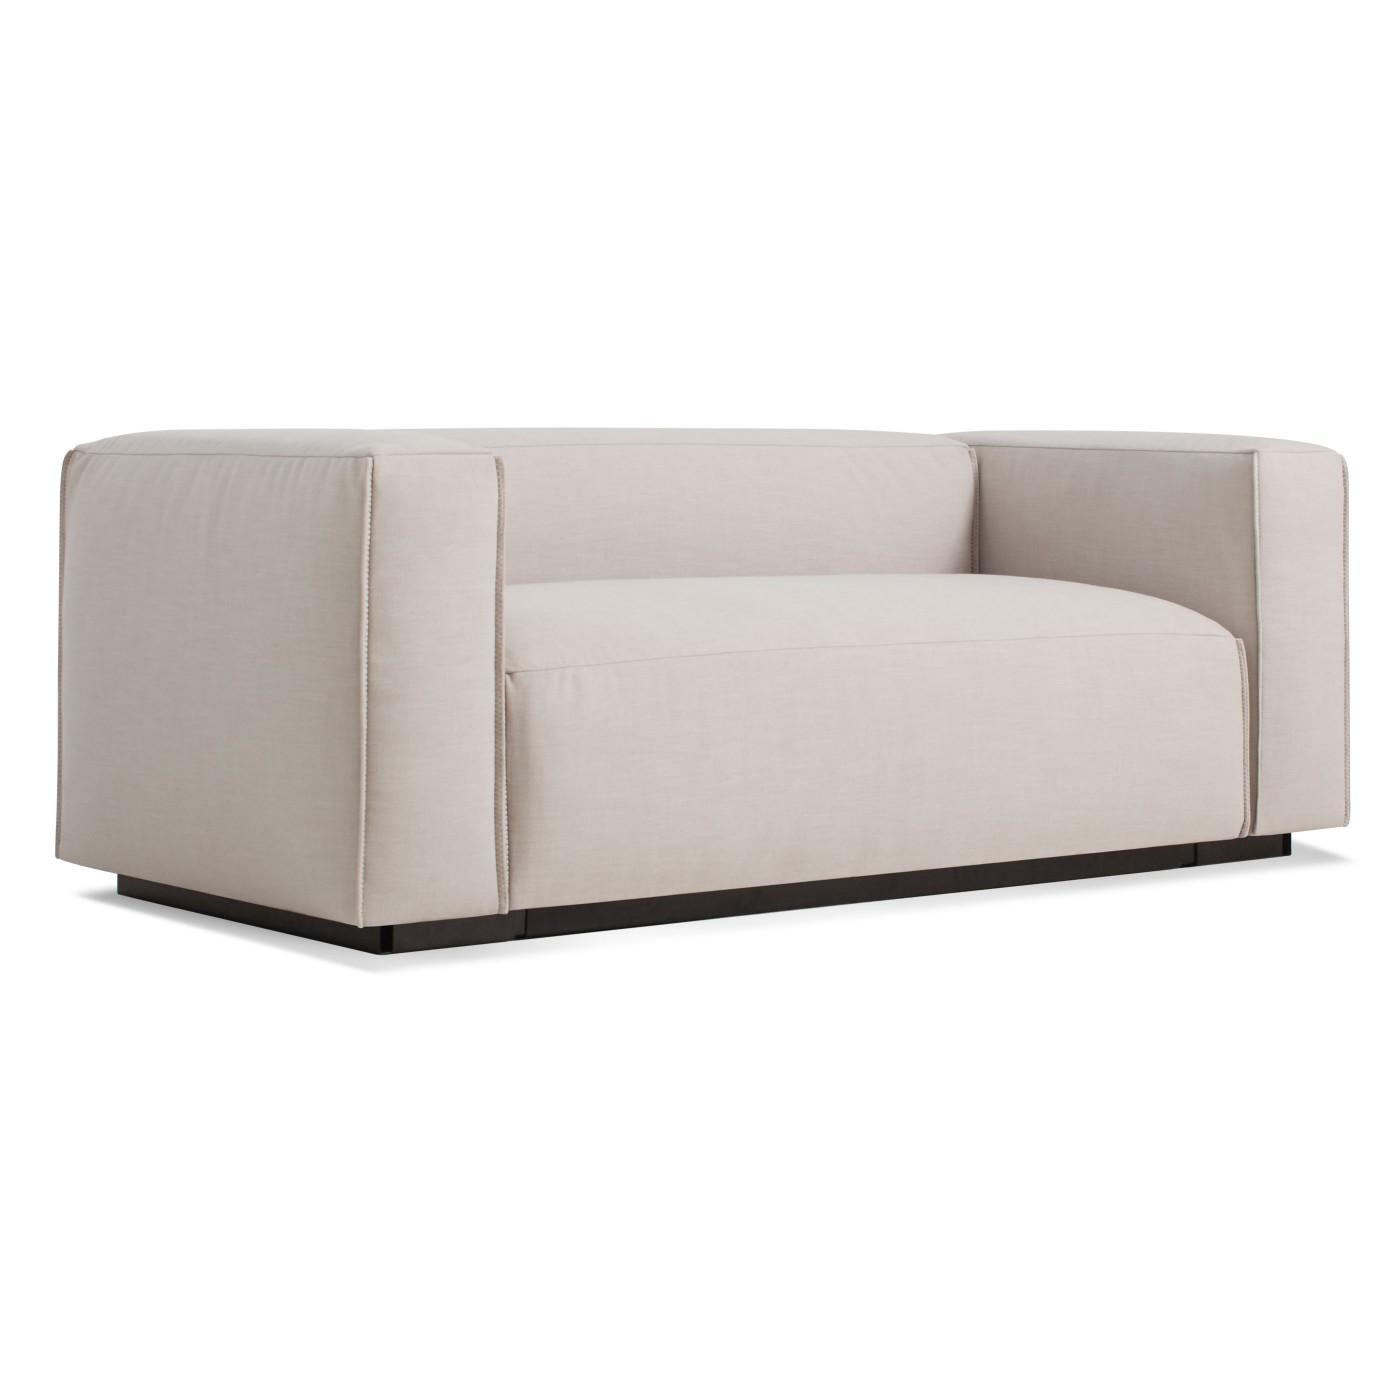 Cleon 74 Armed Sofa By Blue Dot Hub